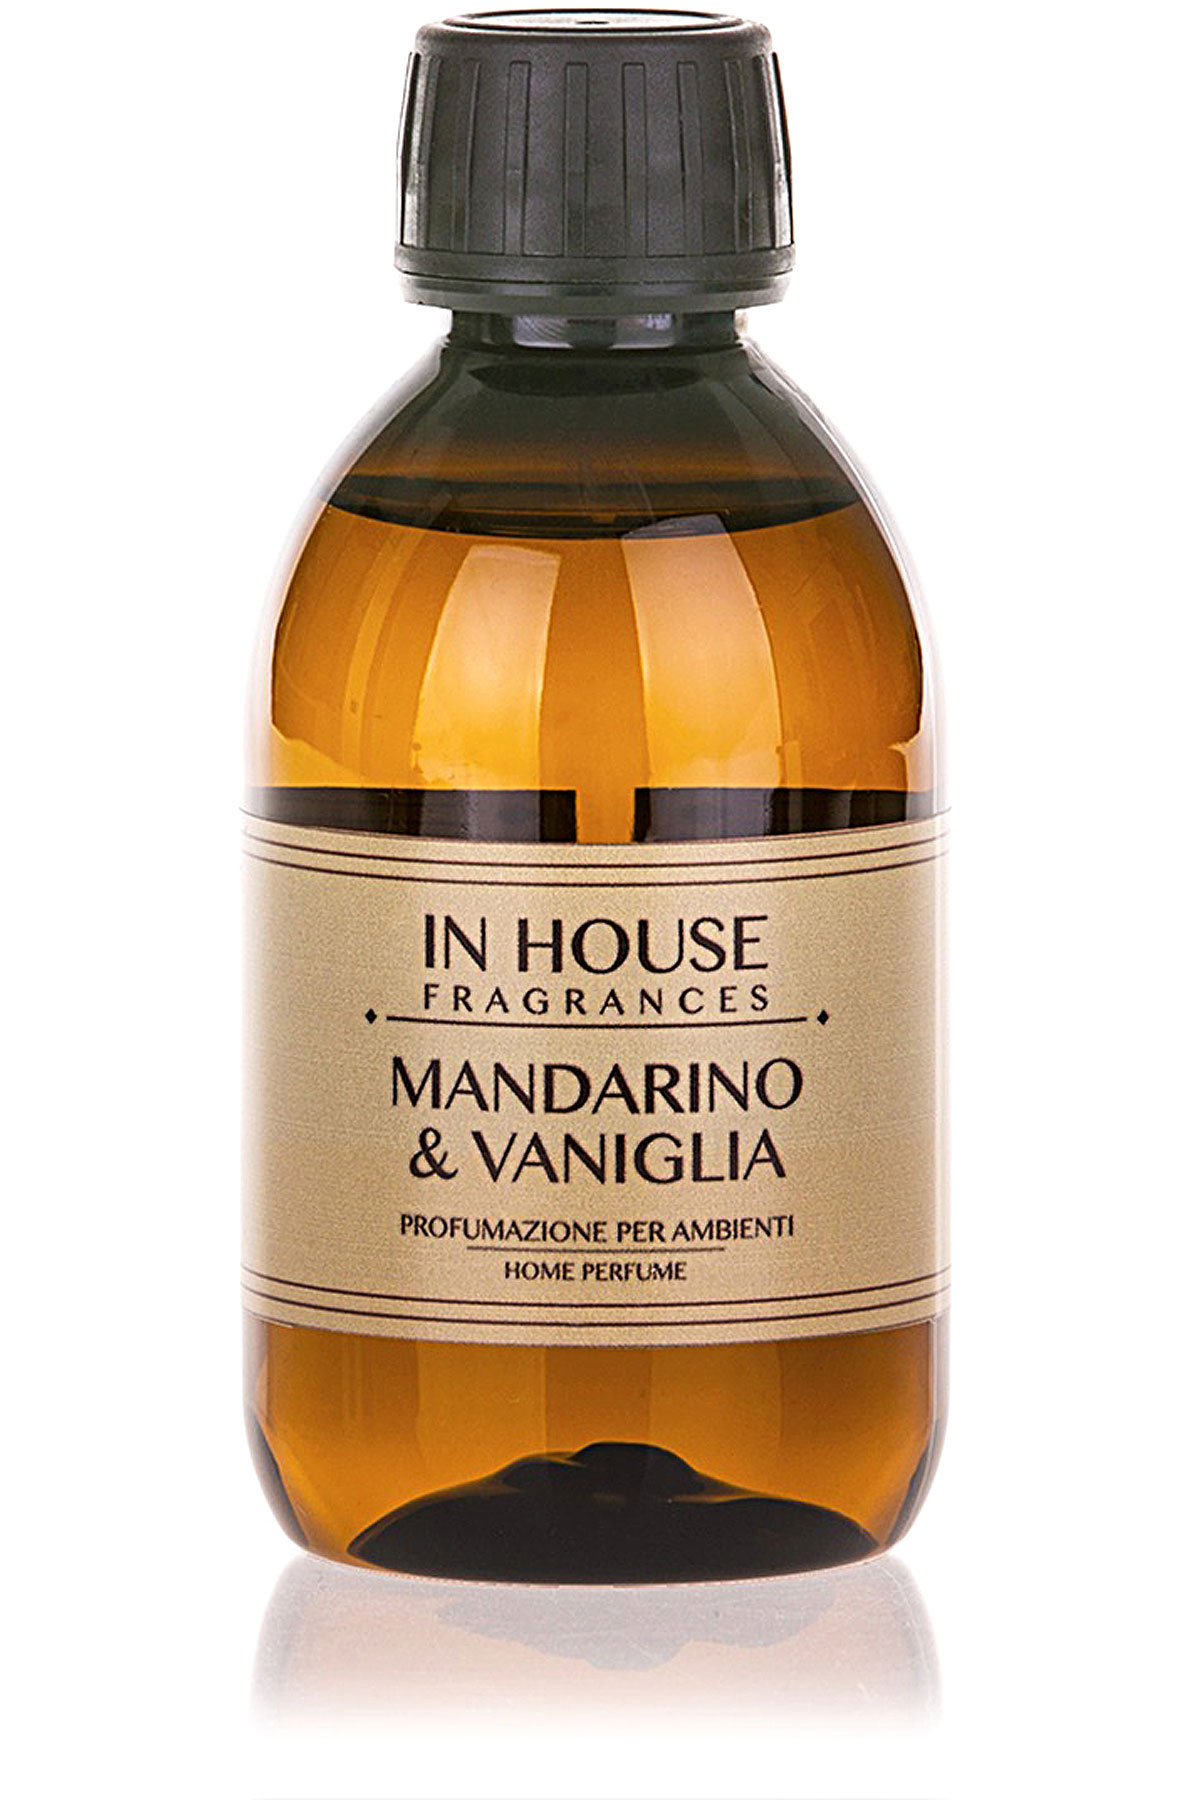 In House Fragrances Home Scents for Men, Mandarino & Vaniglia - Refill - 200 Ml, 2019, 200 ml